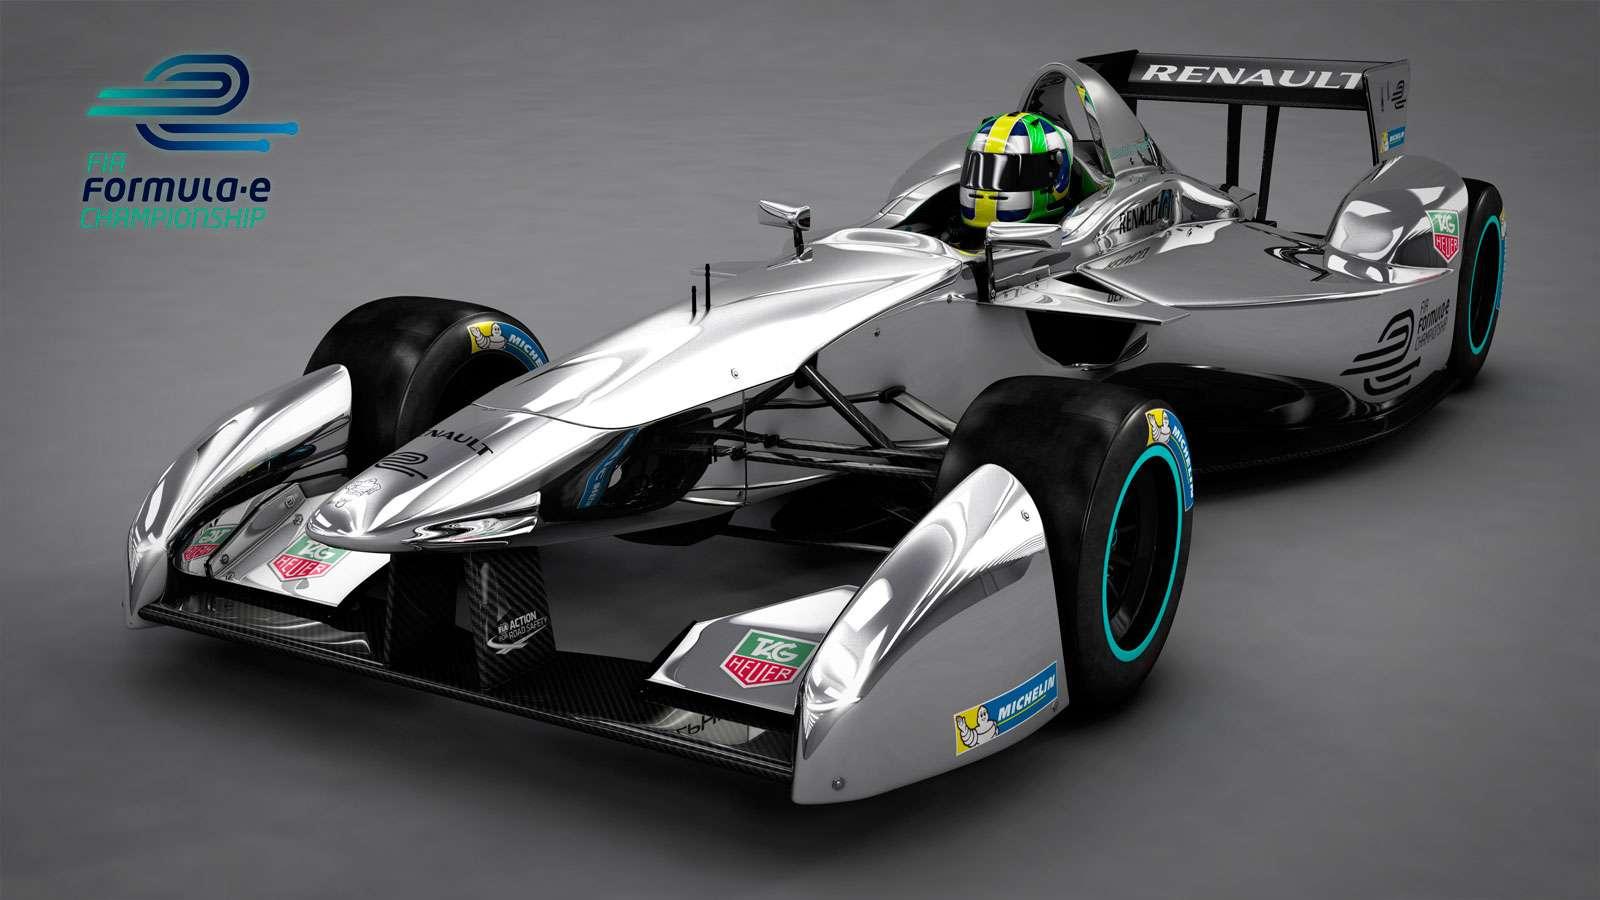 2014-2015 Formula E Car